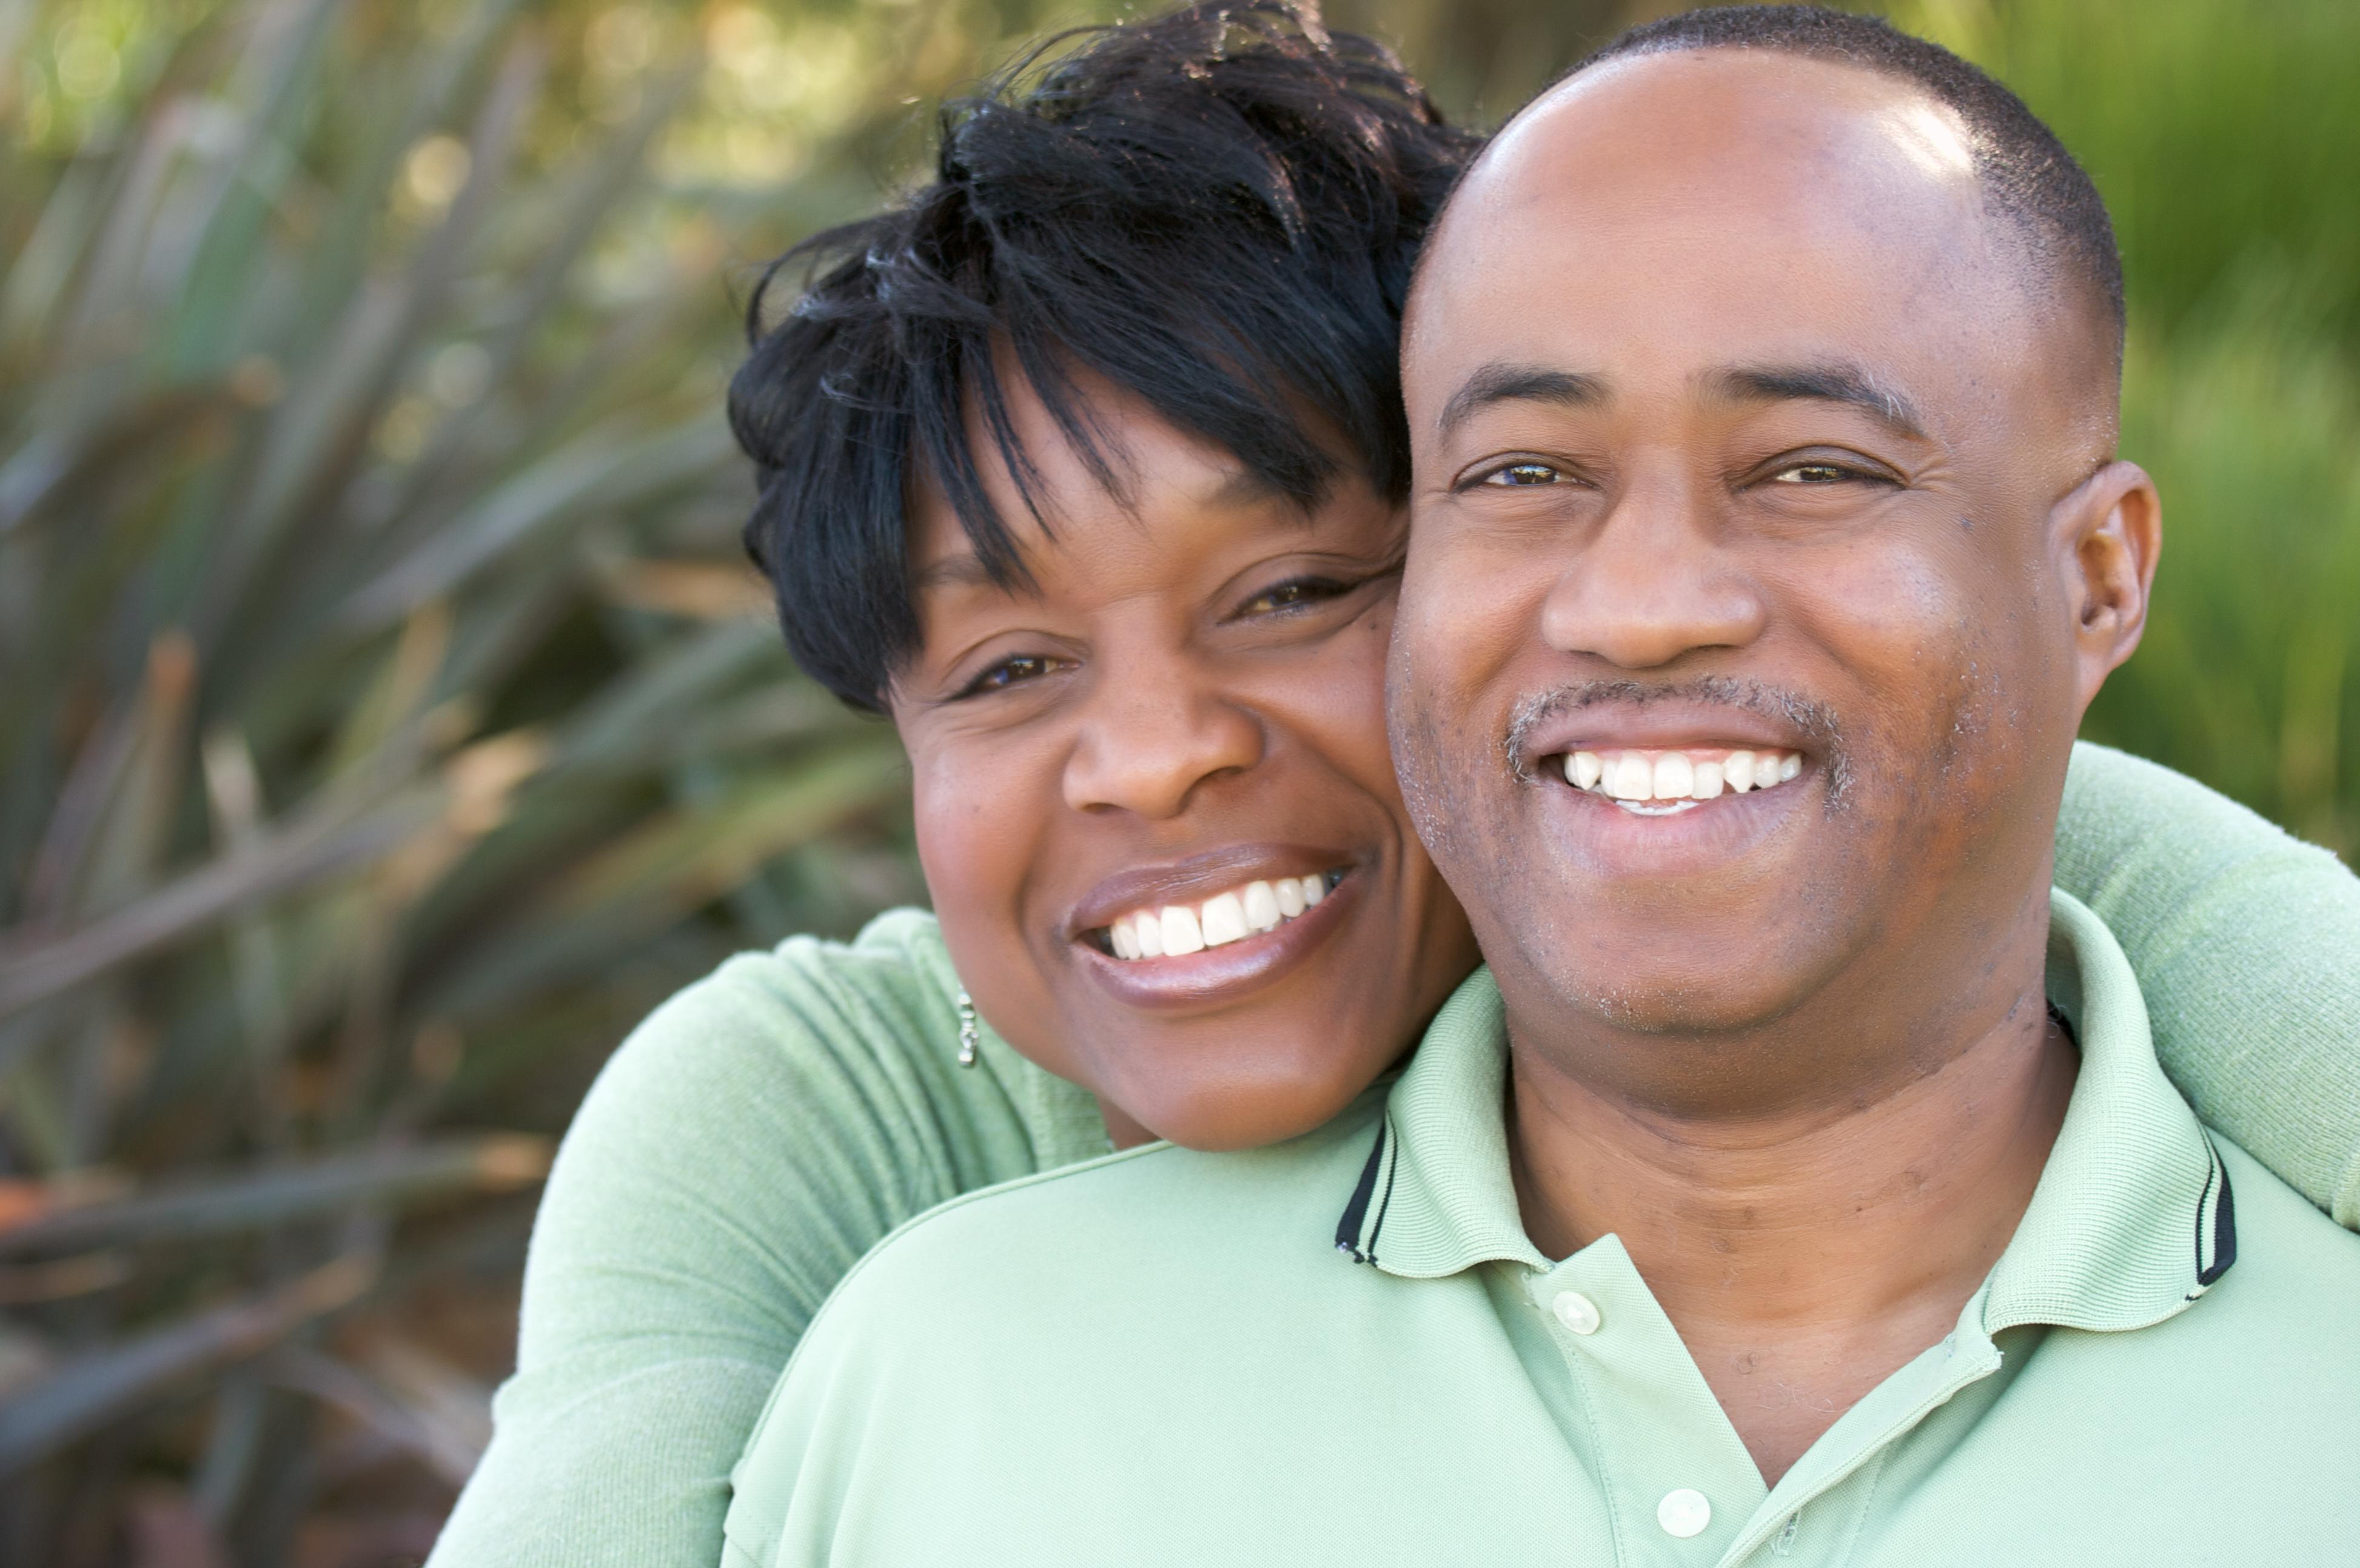 Family History Raises Risk